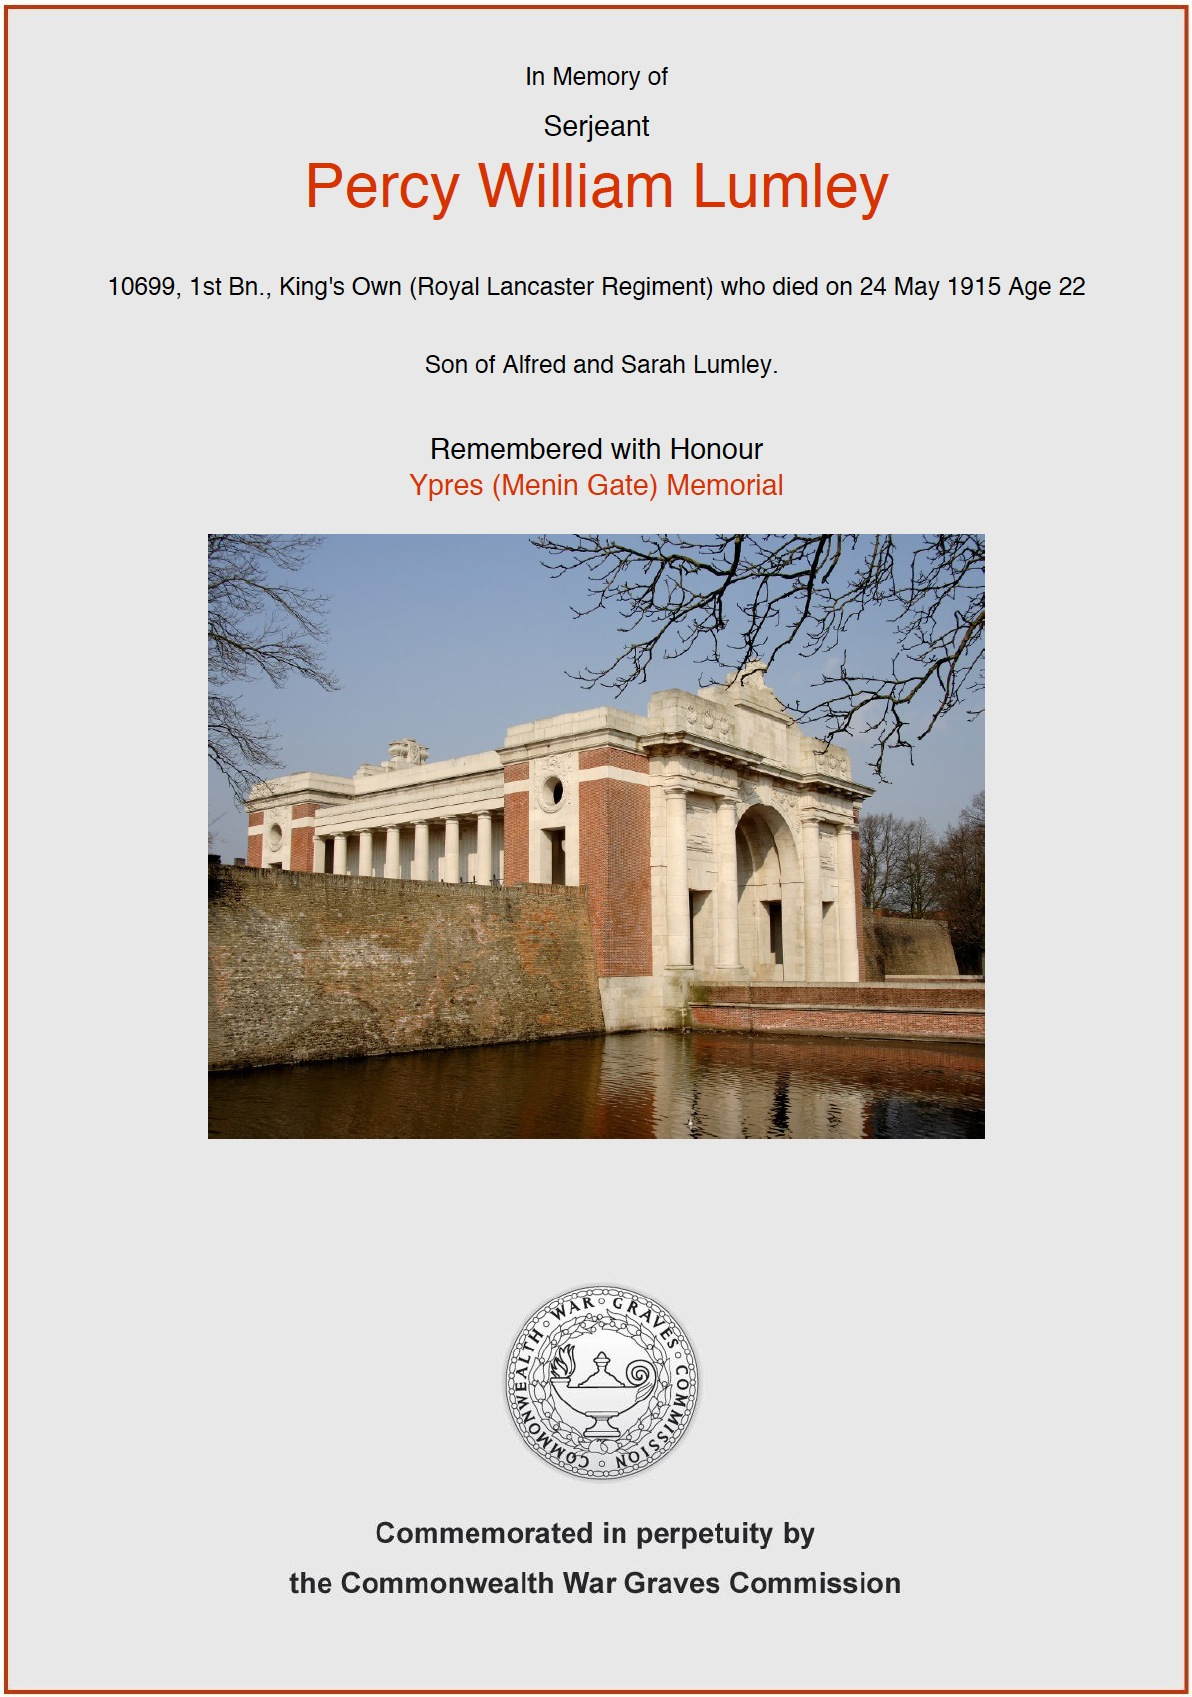 Percy William Lumley's CWGC Commemorative Certificate